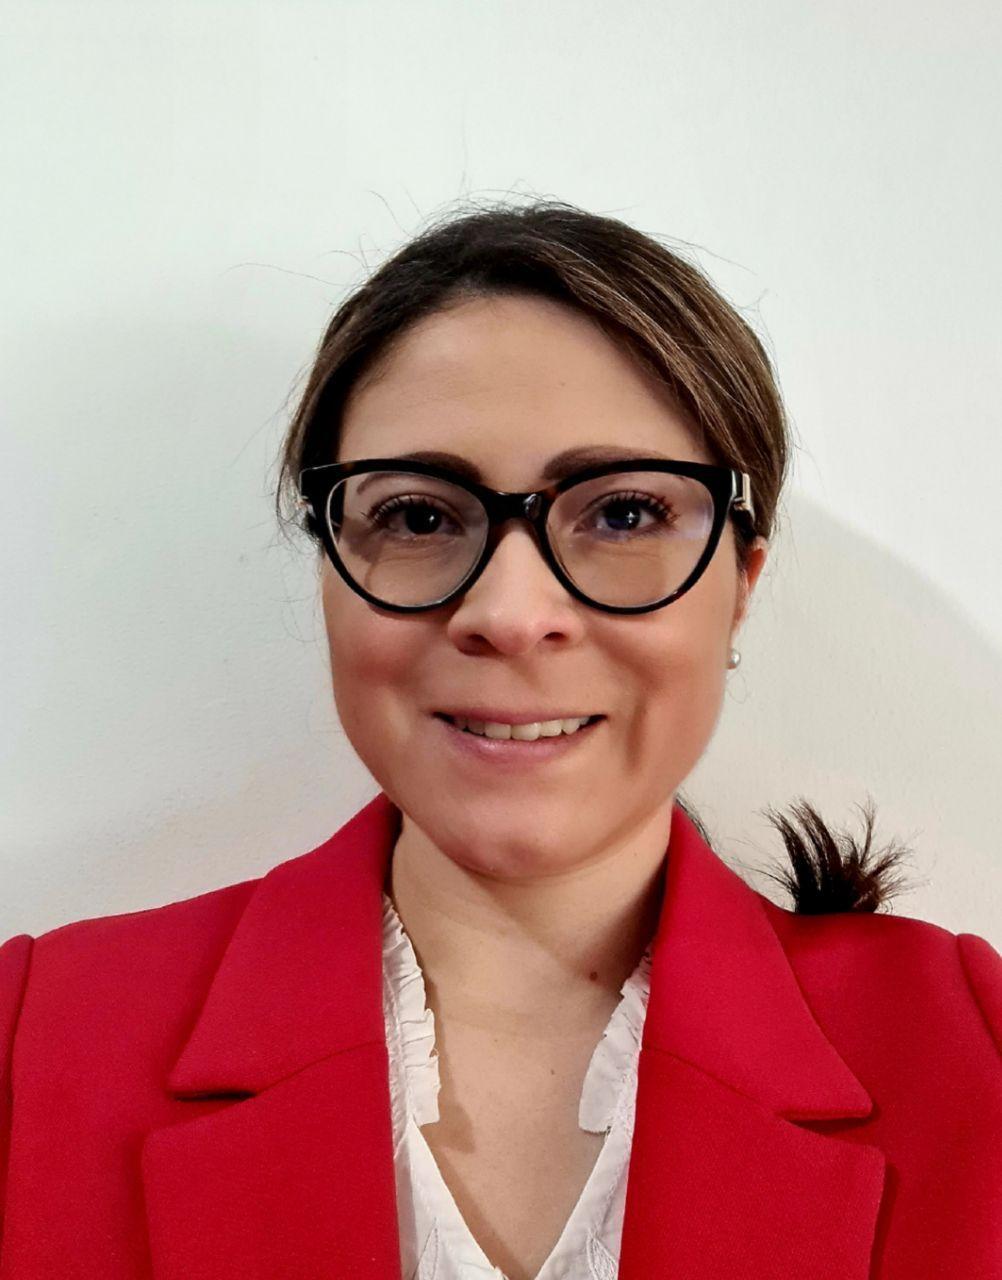 Ana Maria Fuentes Martinez